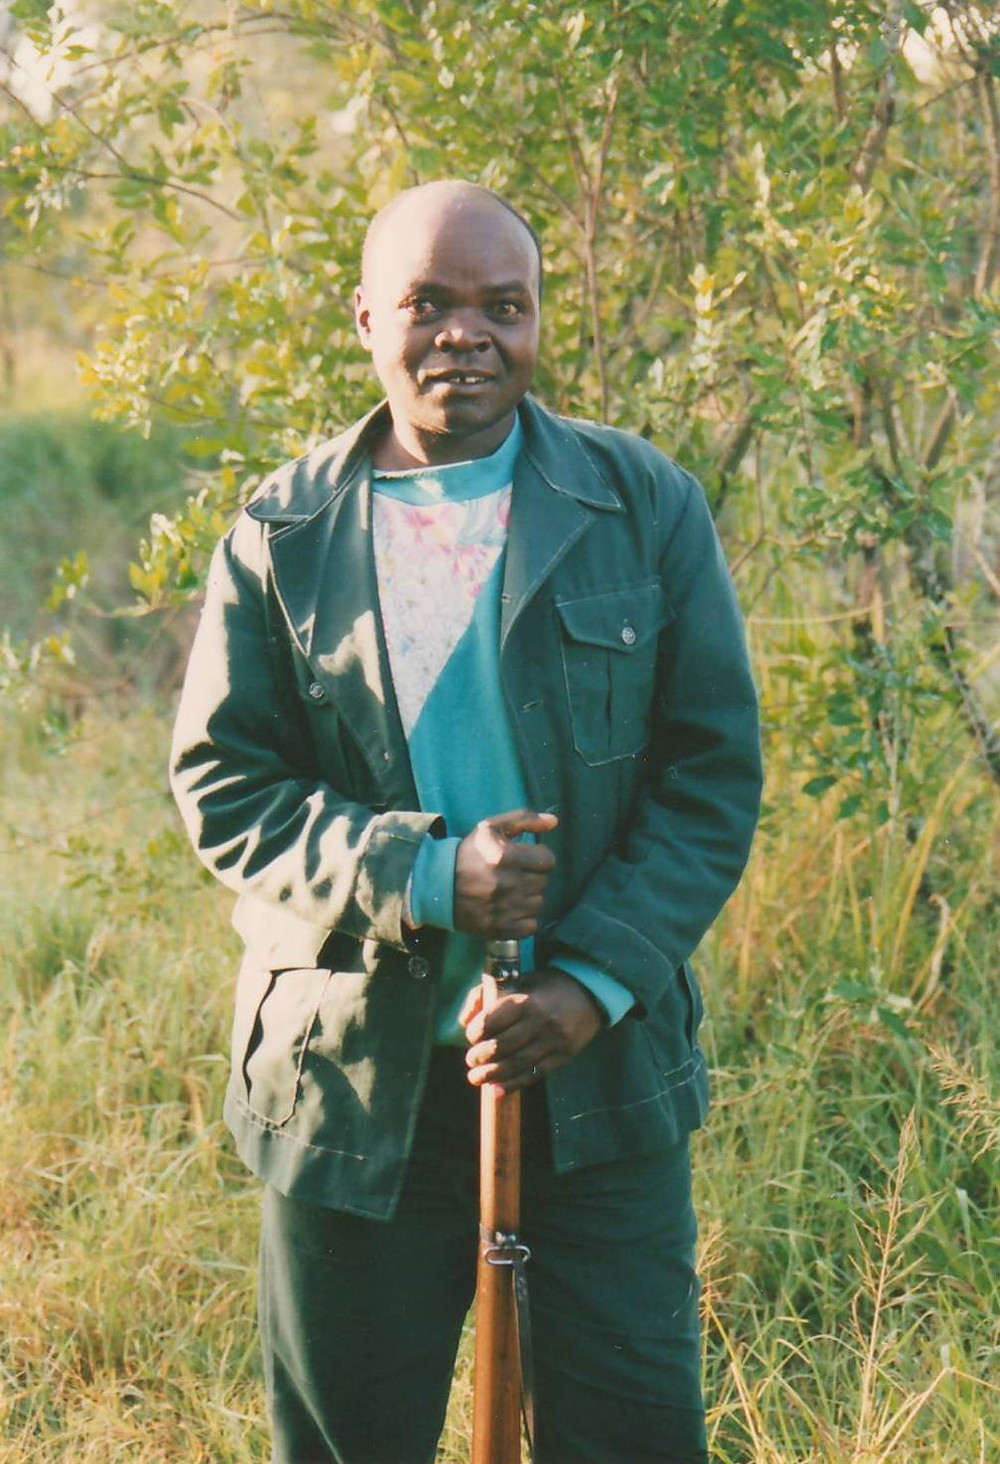 Kenyan man with buffalo rifle